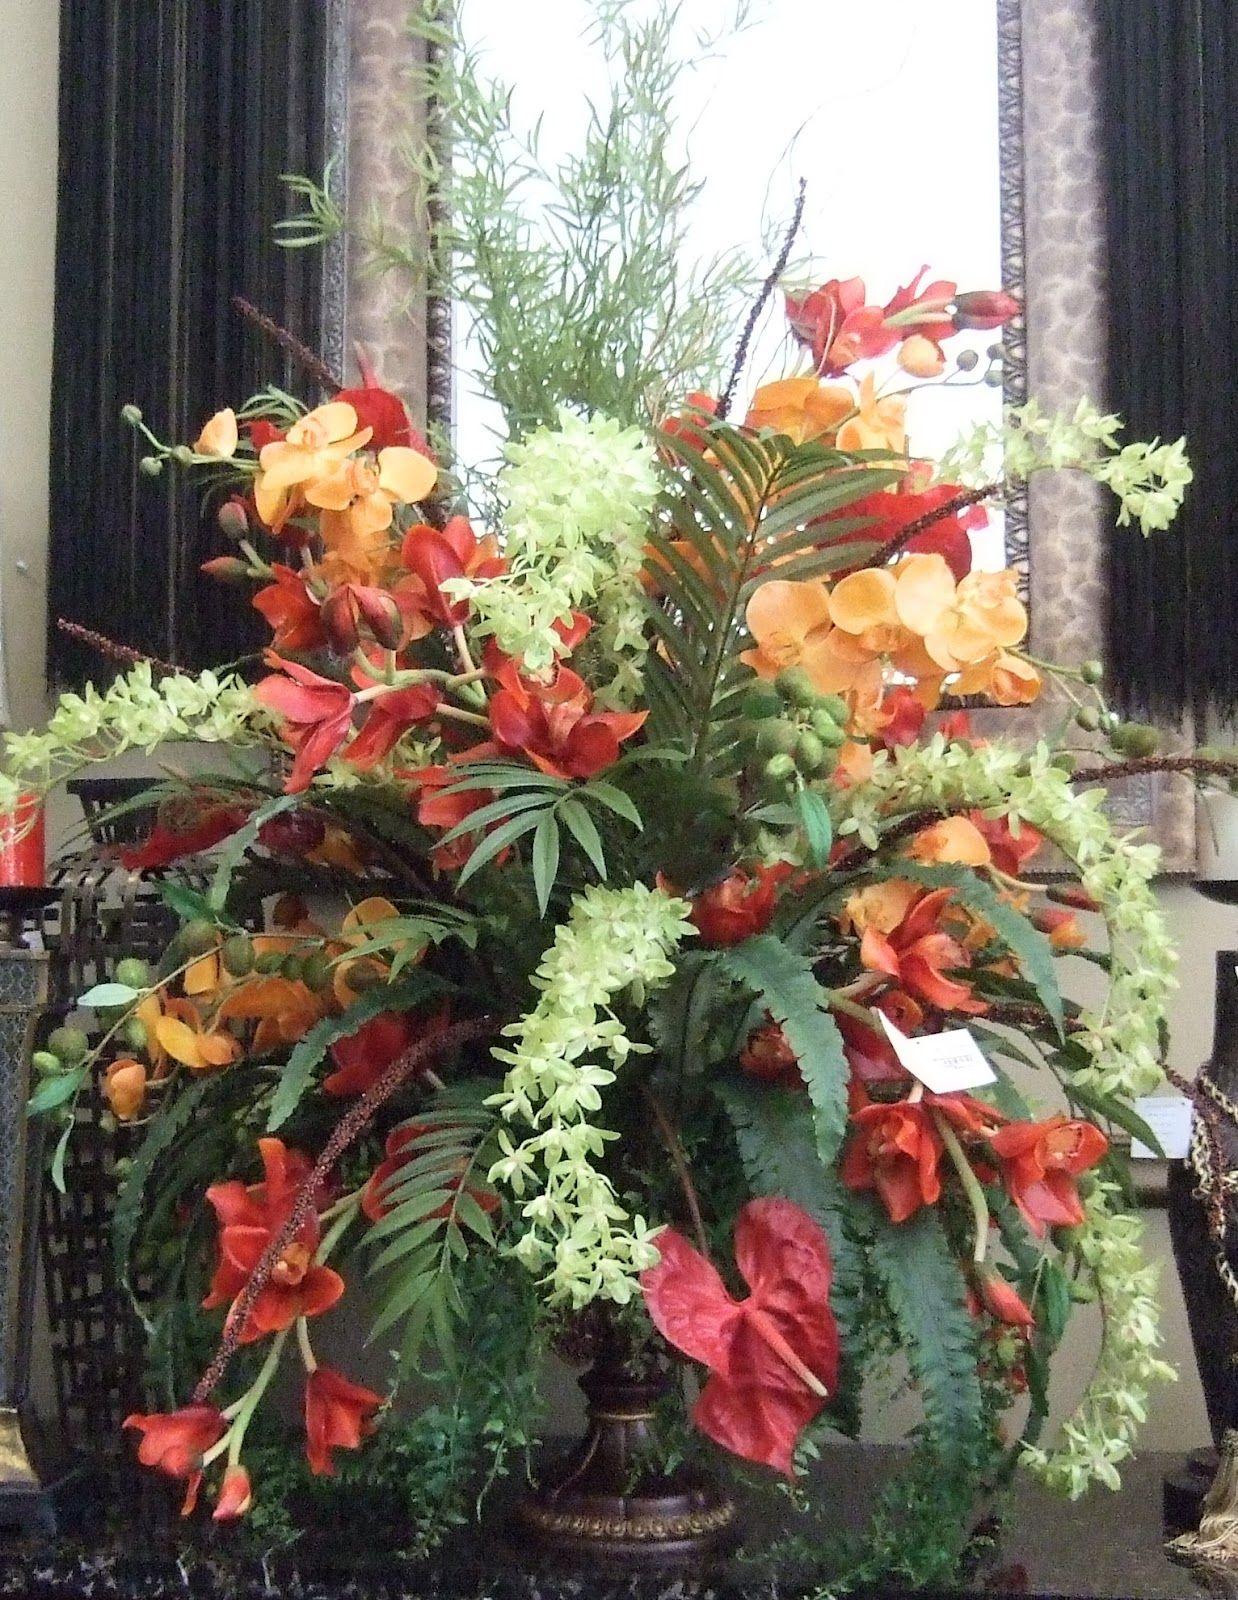 Ana silk flowers ideas and inspiration images beautiful and ana silk flowers ideas and inspiration images beautiful and luxury tropical silk flowers arrangements mightylinksfo